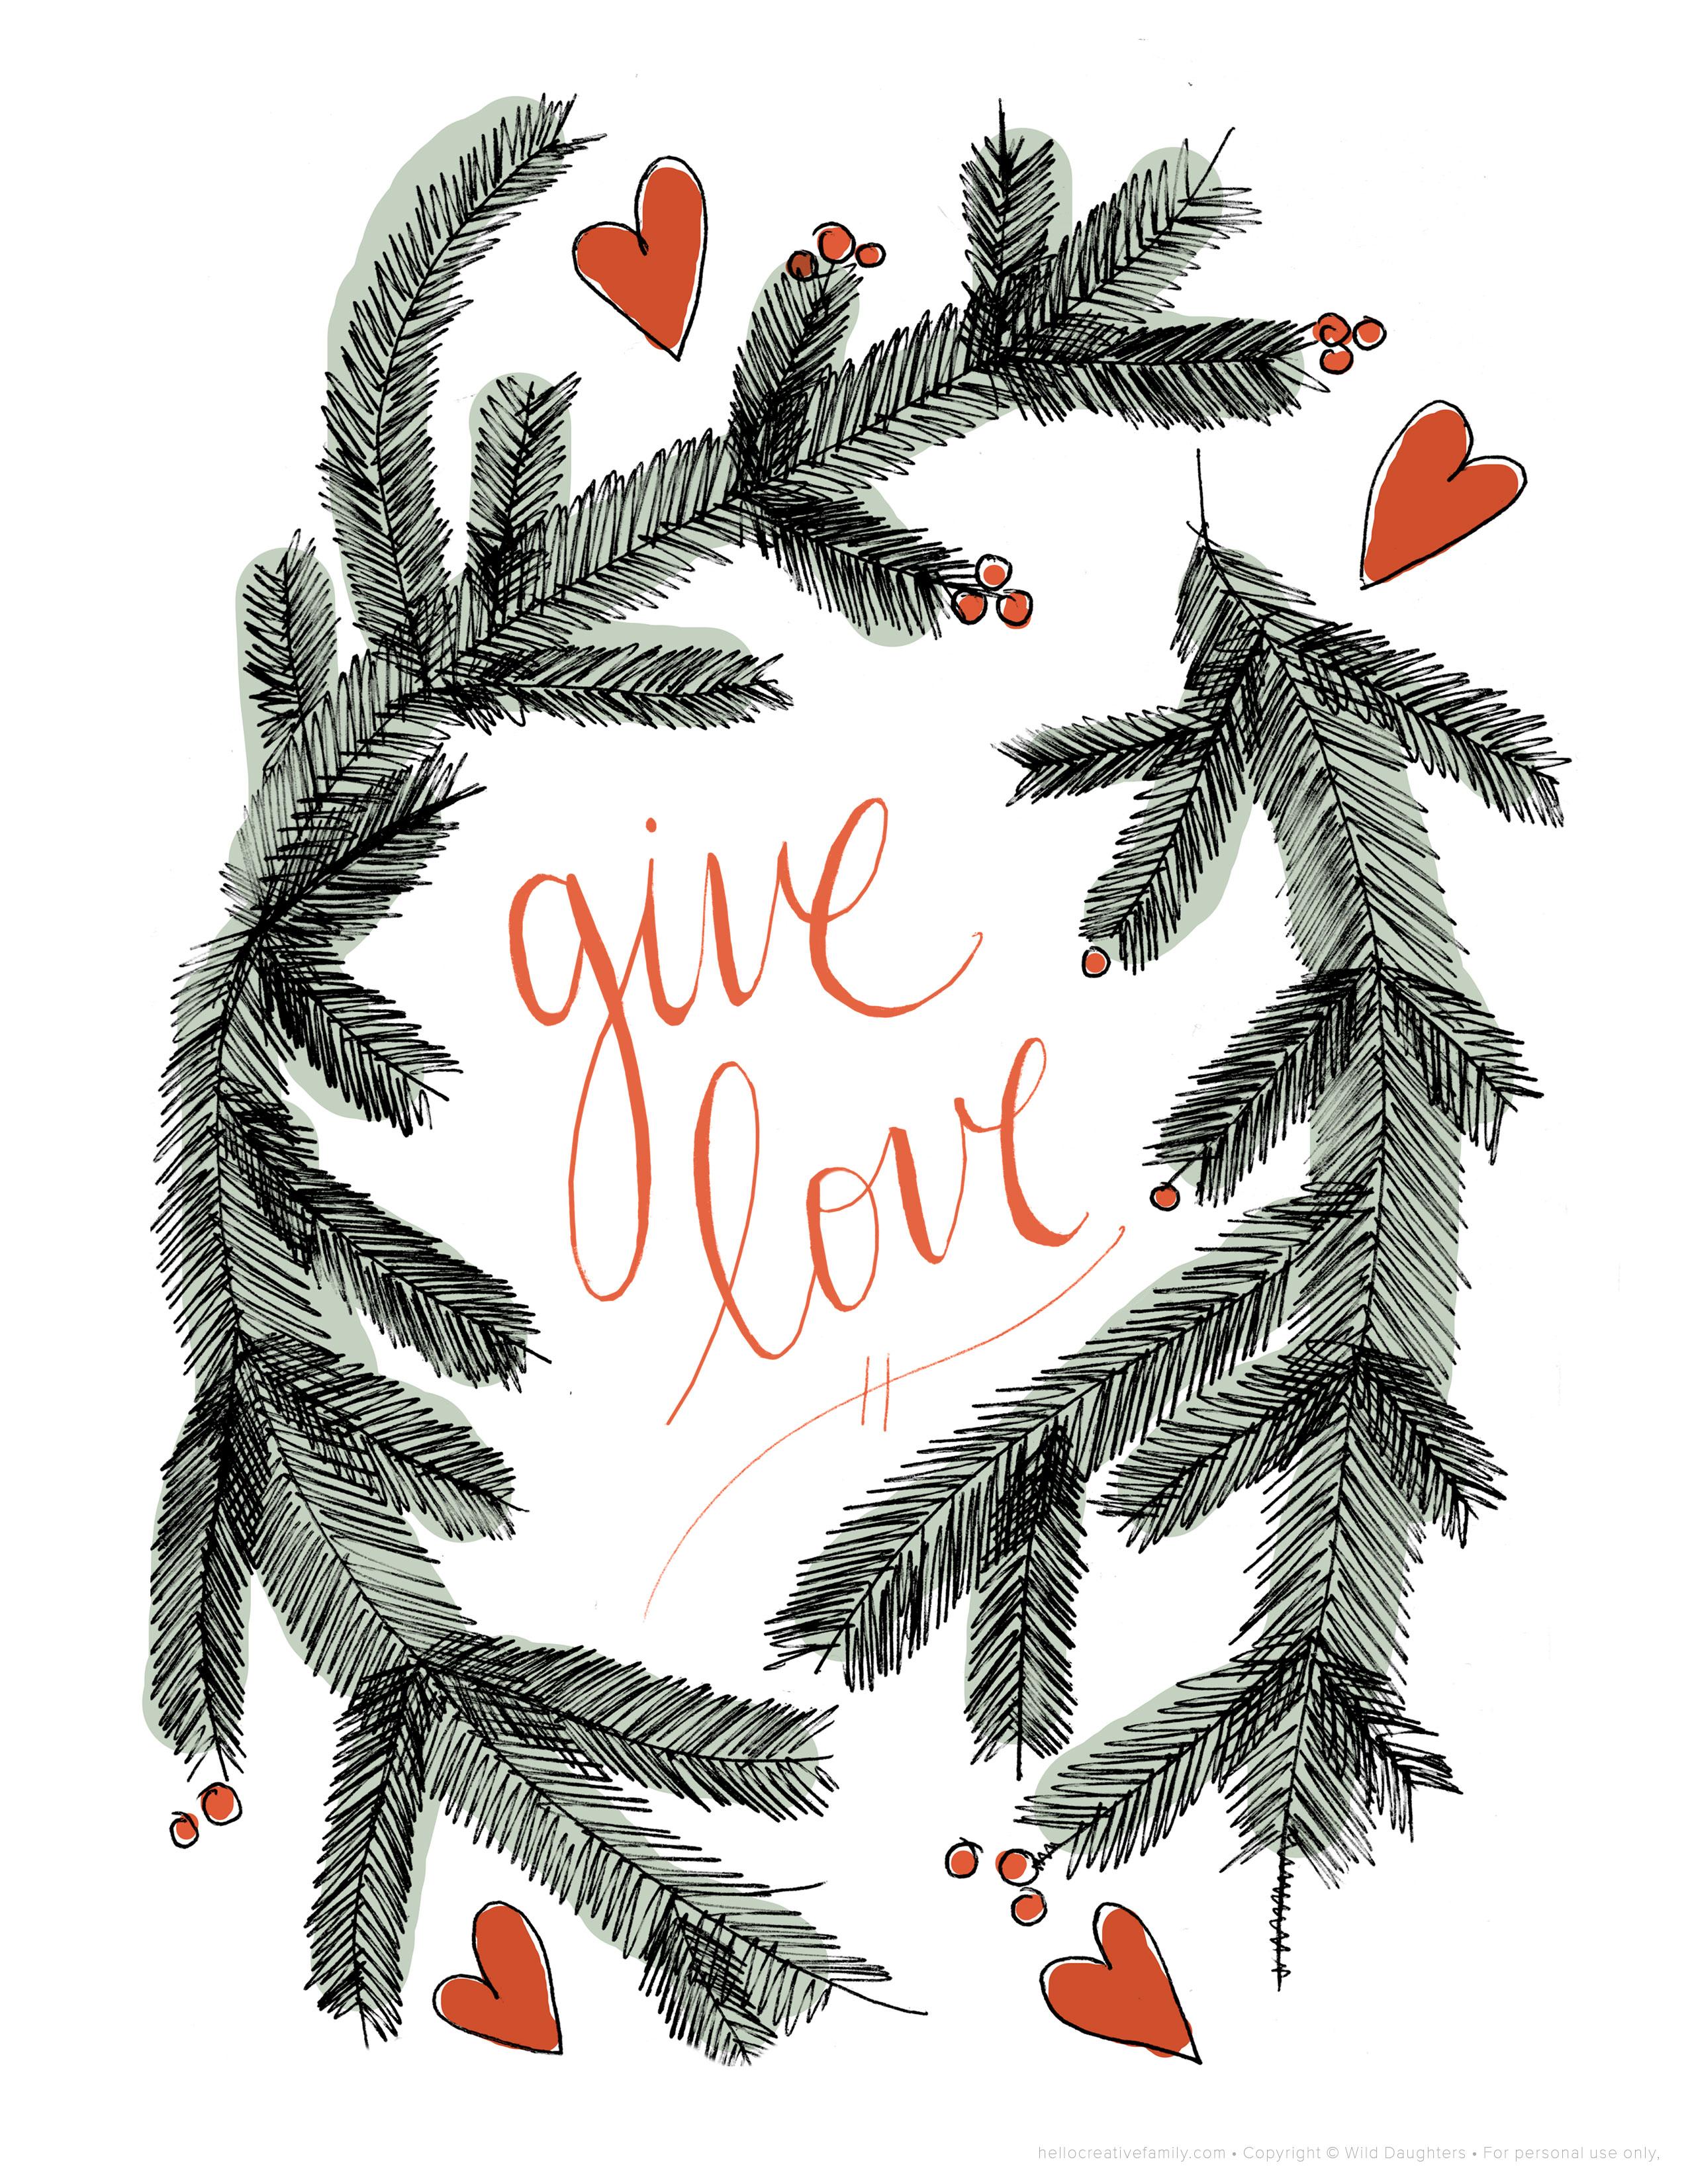 download your free holiday printable - Free Holiday Printable